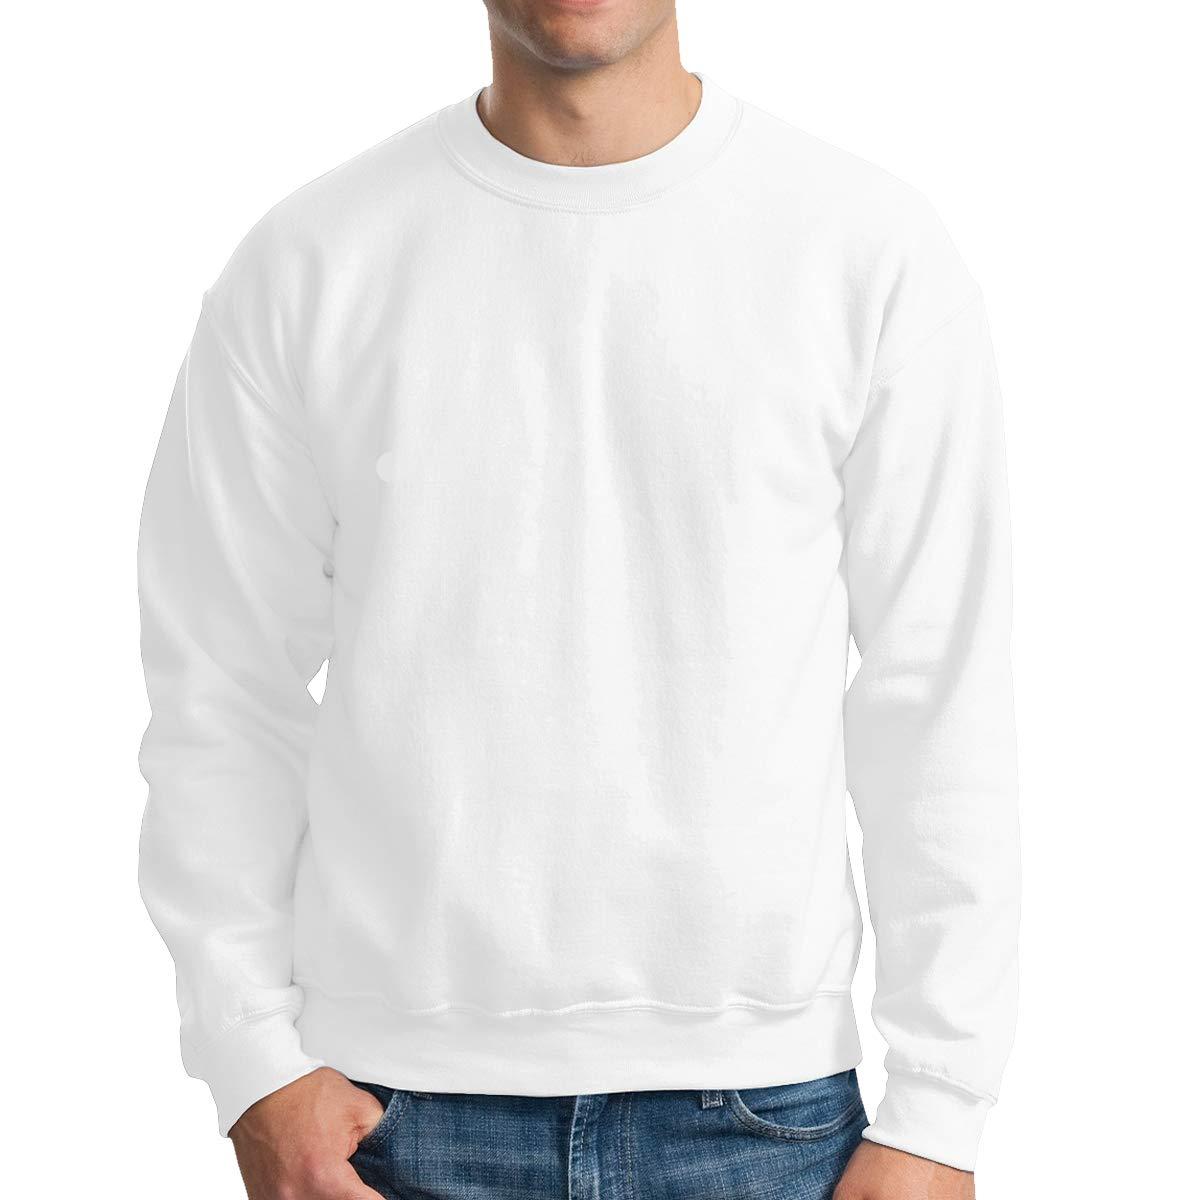 Donald Marjory Water Earth Air Fire Print Mens Powerblend Fleece Pullover Crewneck Sweatshirt